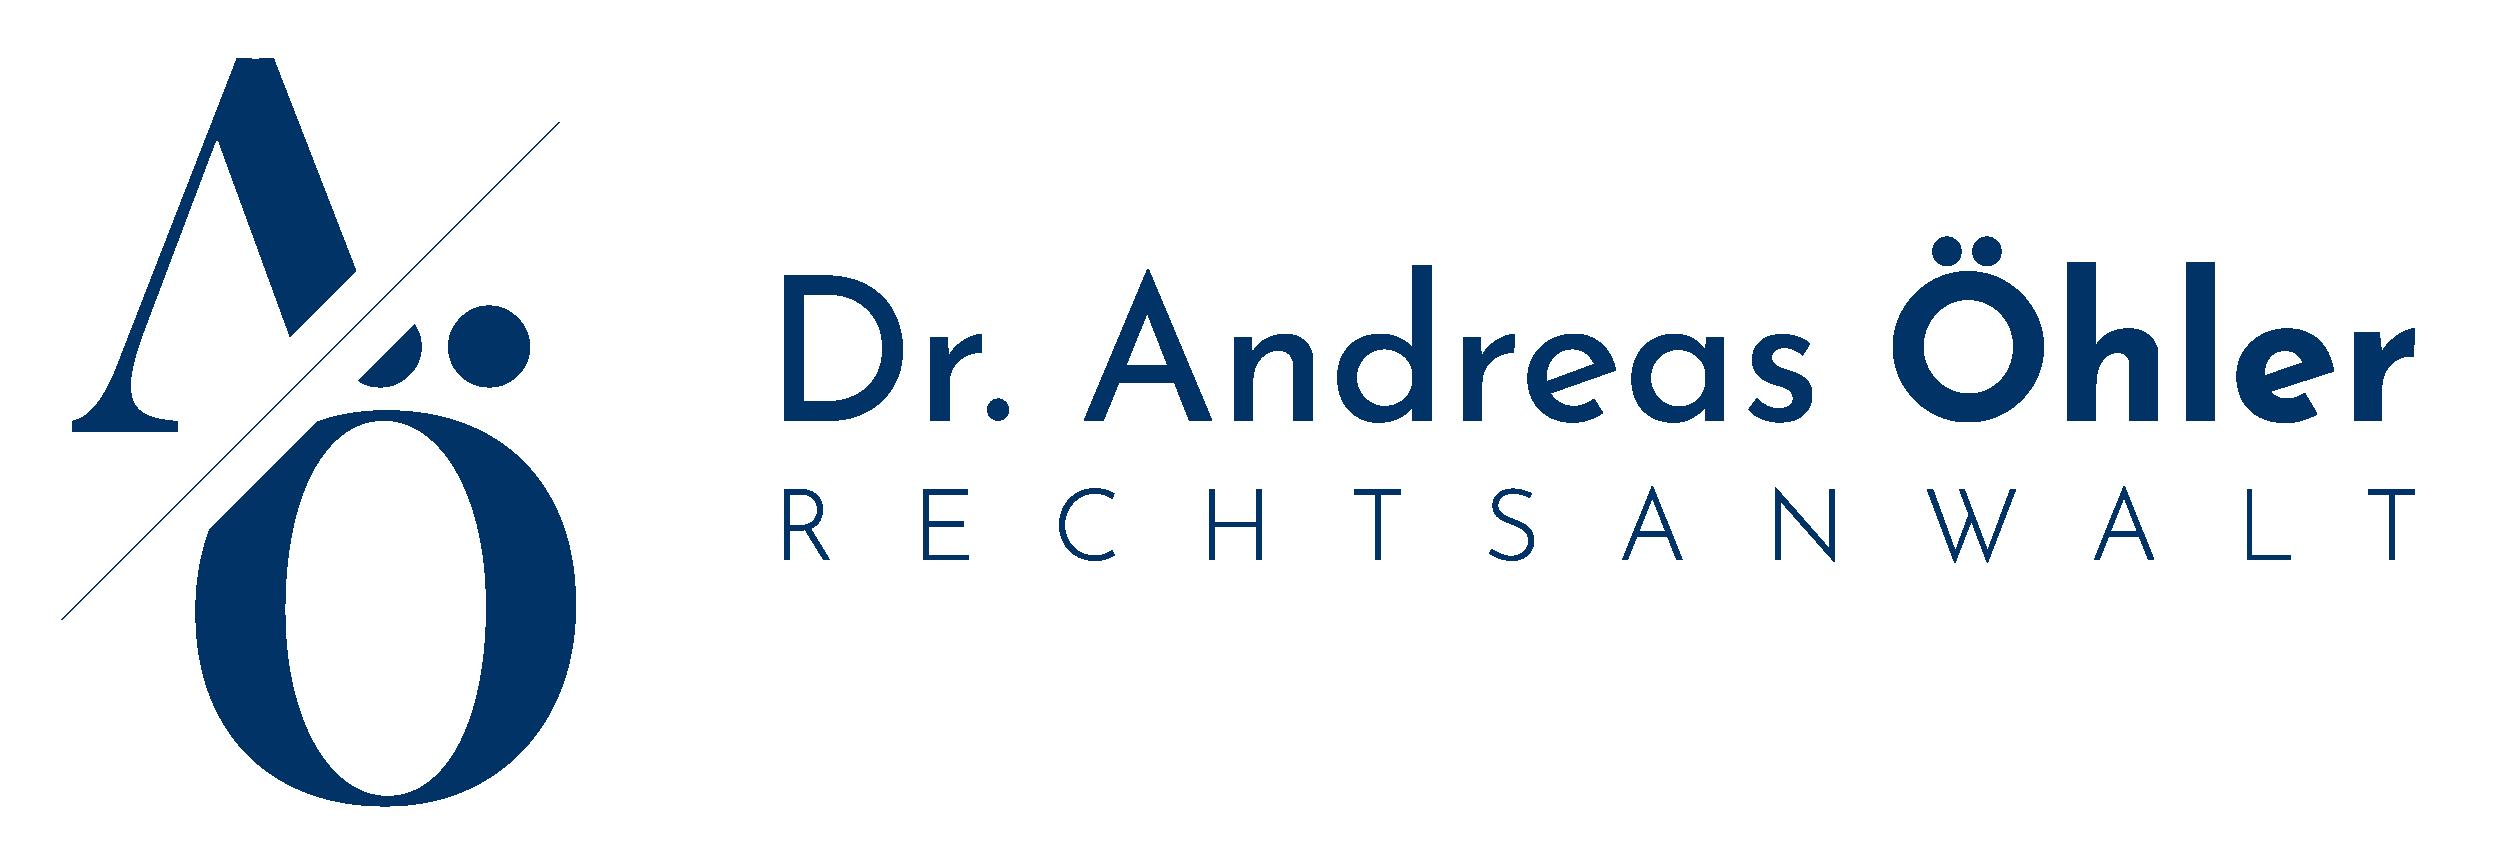 Dr. Andreas Öhler - Logo